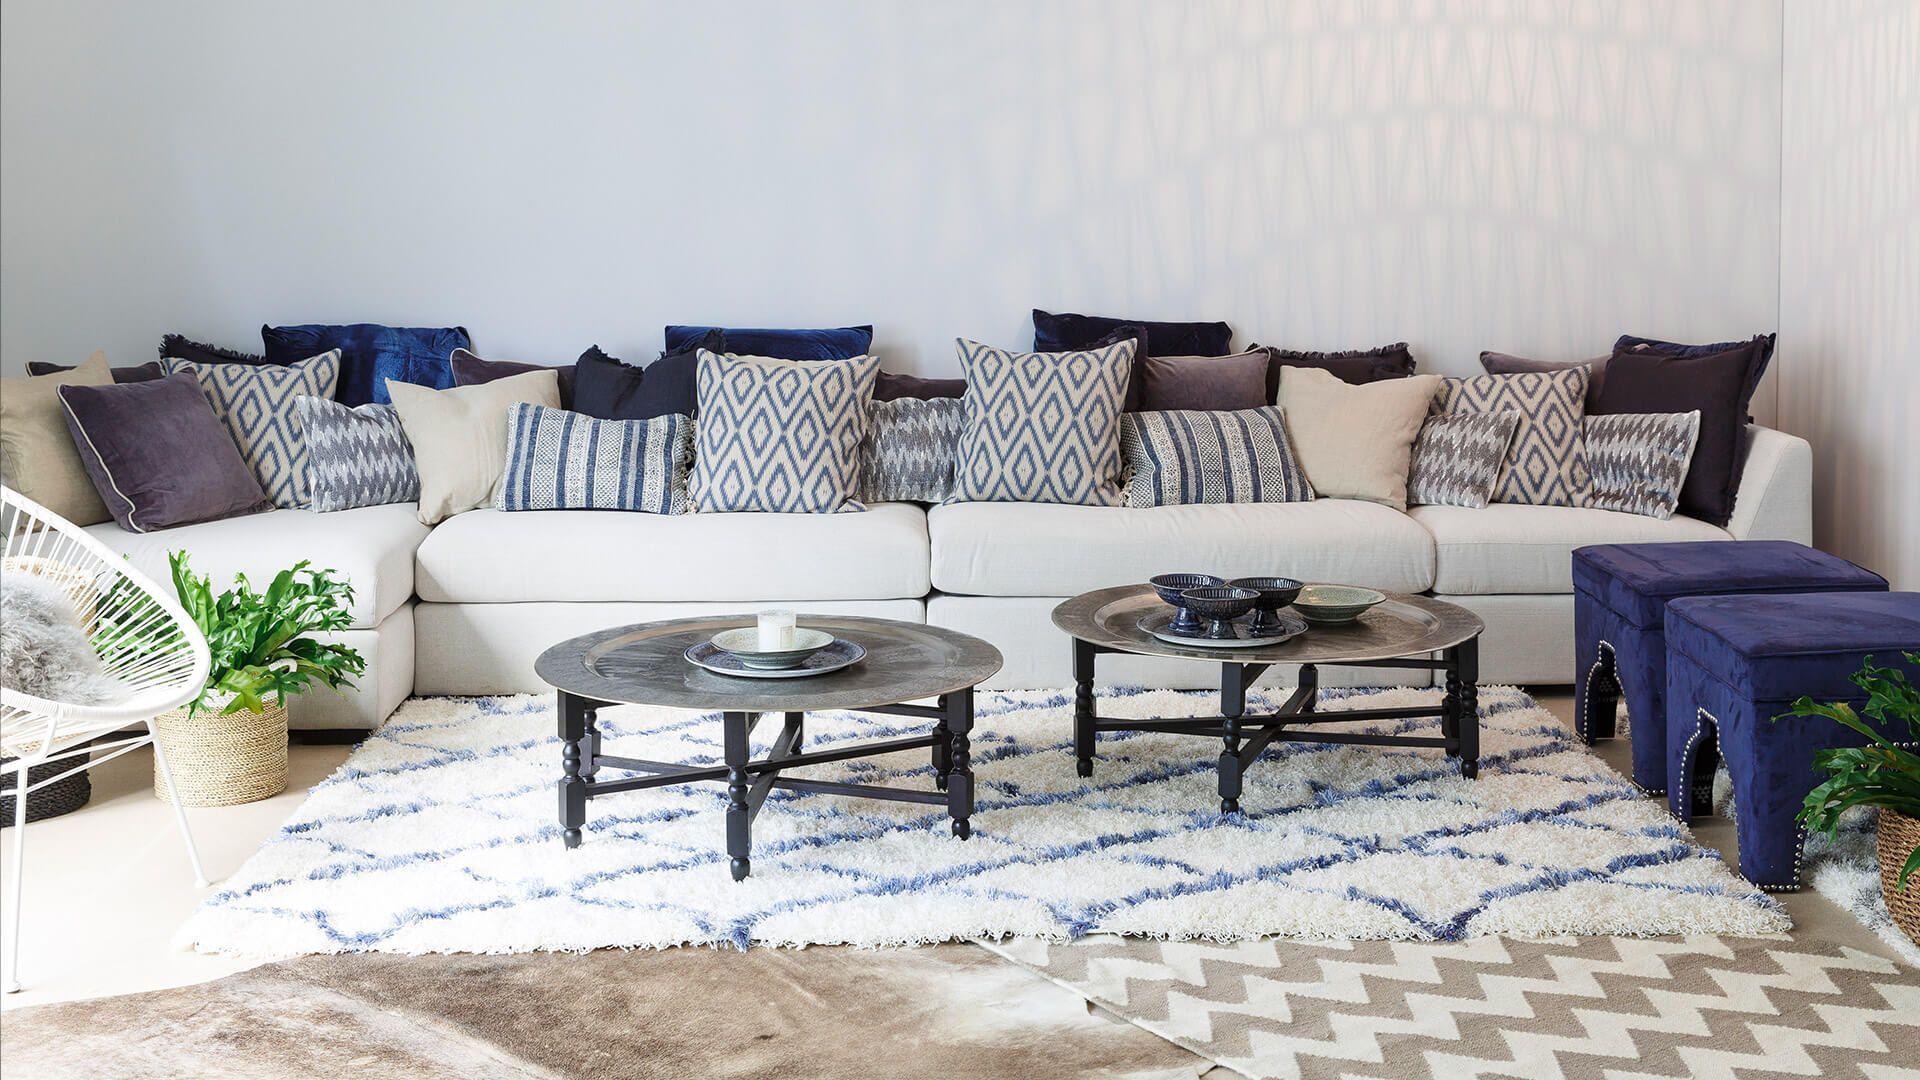 Marokko Lounge   5 Восточный интерьер декор   Pinterest ...